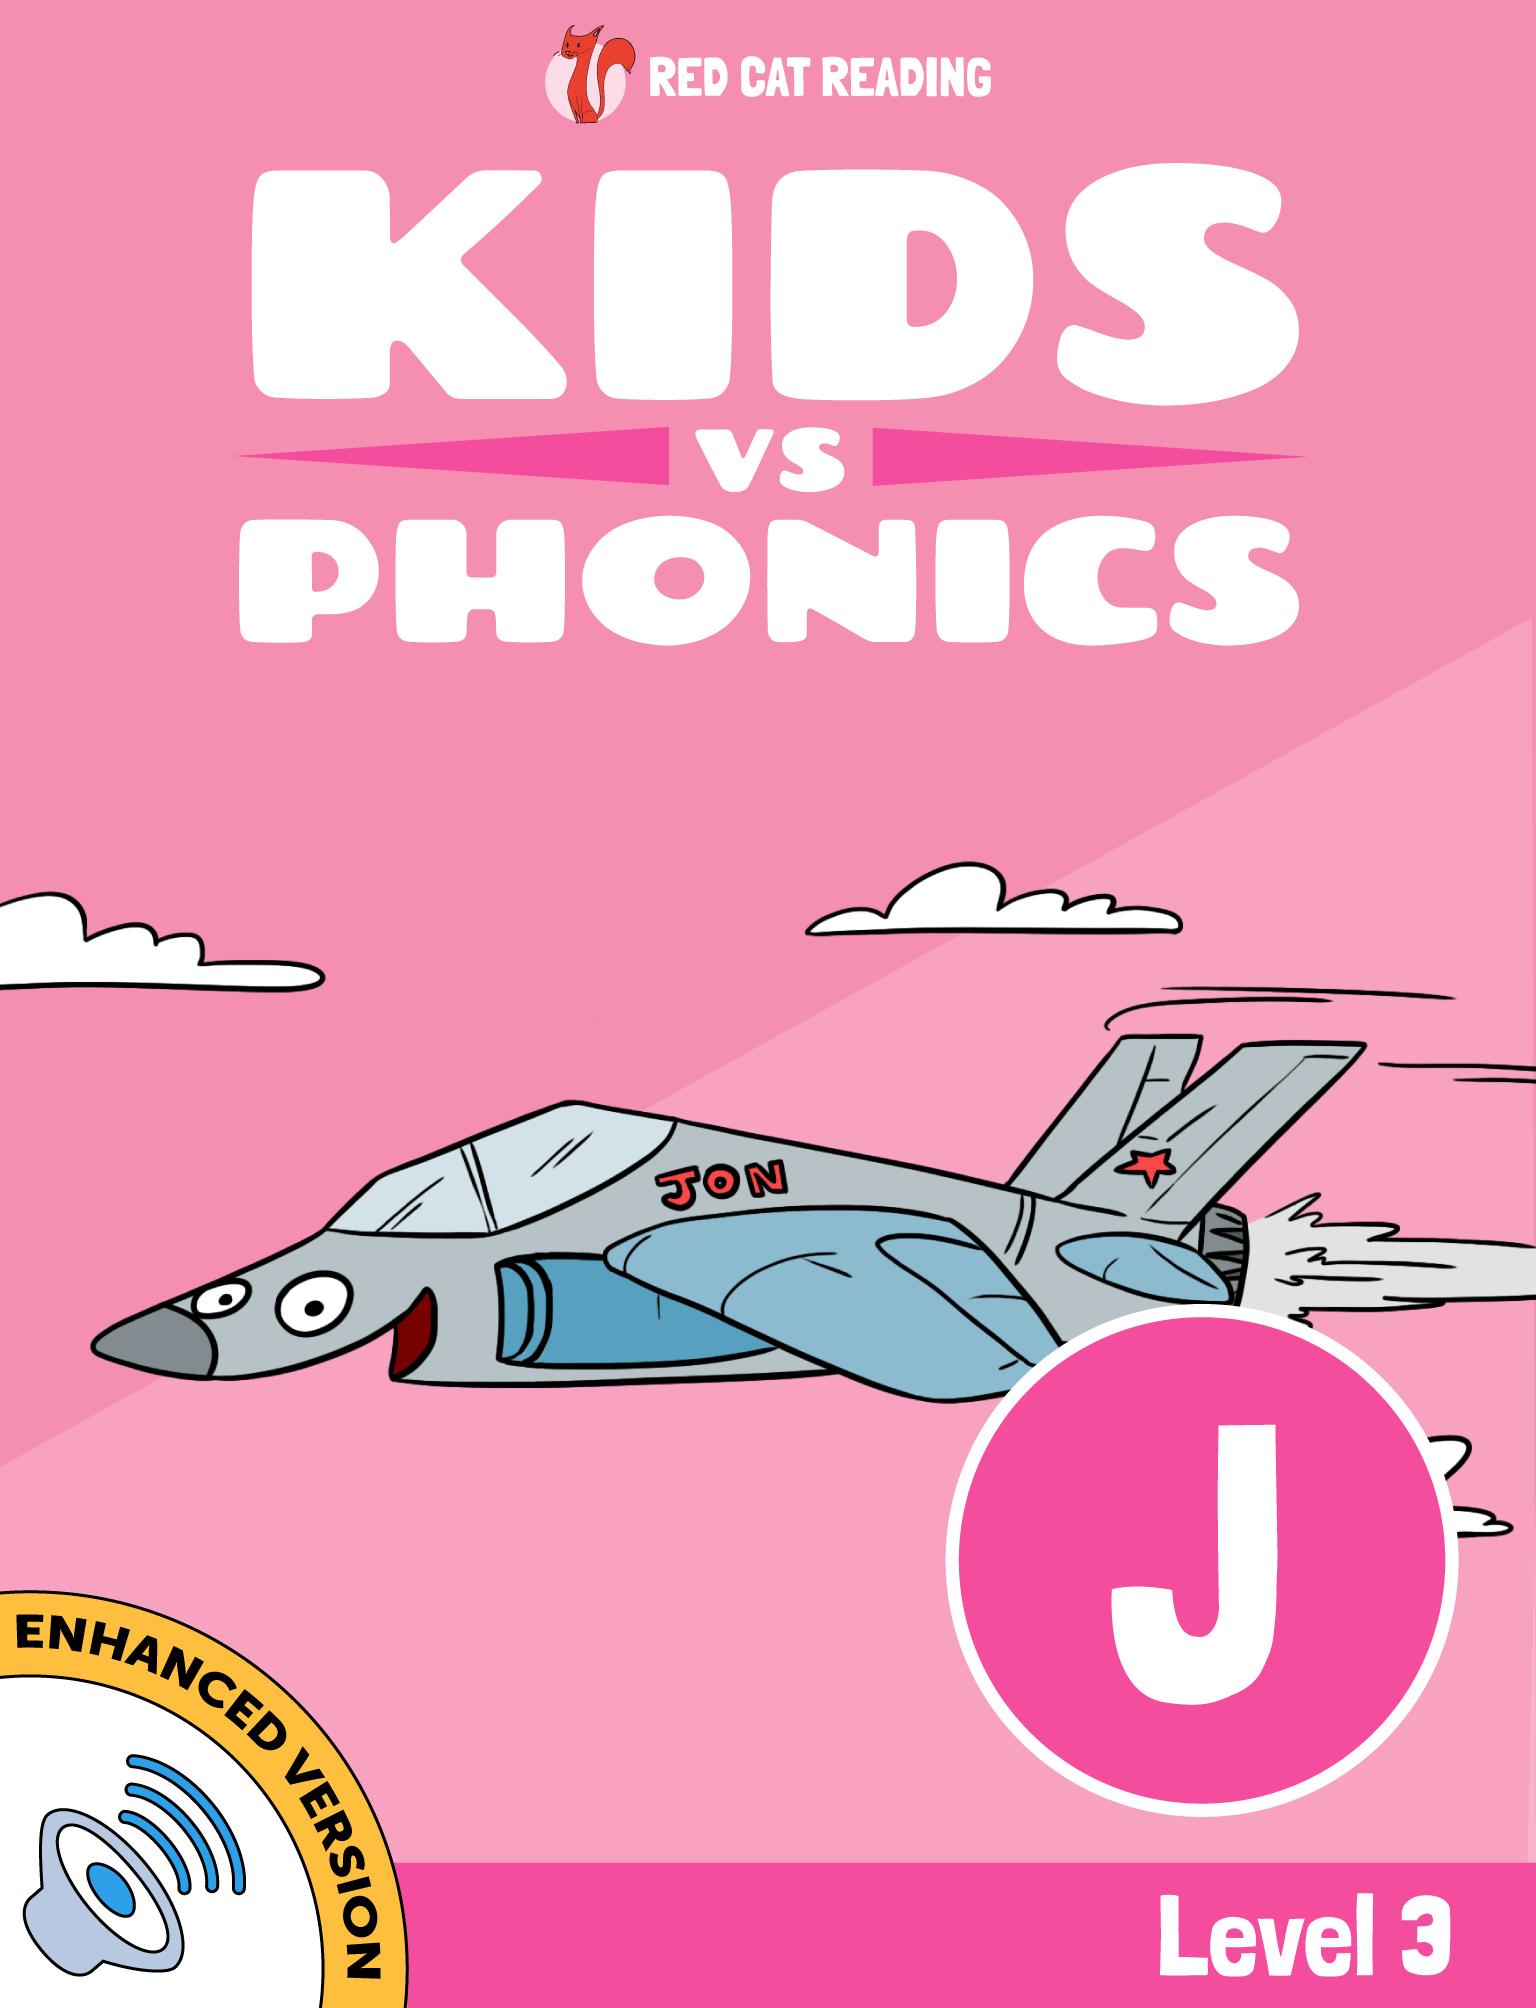 Red Cat Reading Kids vs Phonics Level 3 Phonics J Sound